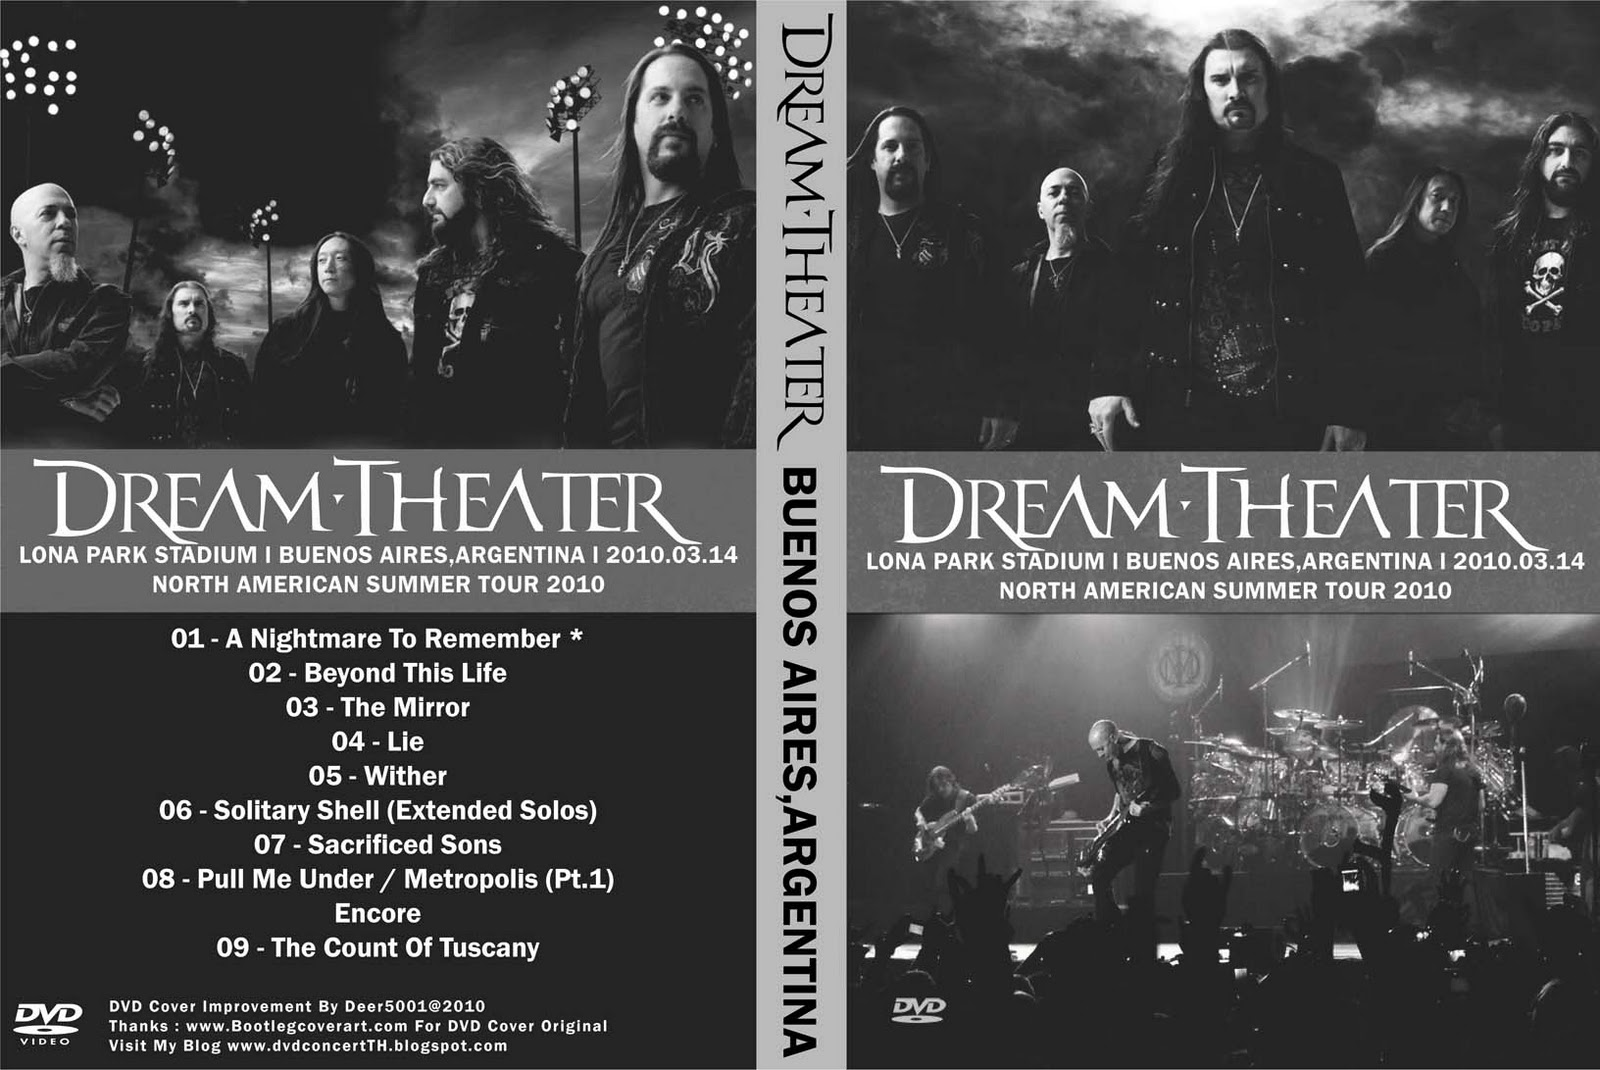 http://2.bp.blogspot.com/_j92JYU6EuQY/TUzoB0lMgCI/AAAAAAAACQs/rz5Lf_lTYi0/s1600/DVD+Cover+Low+Quality+.jpg